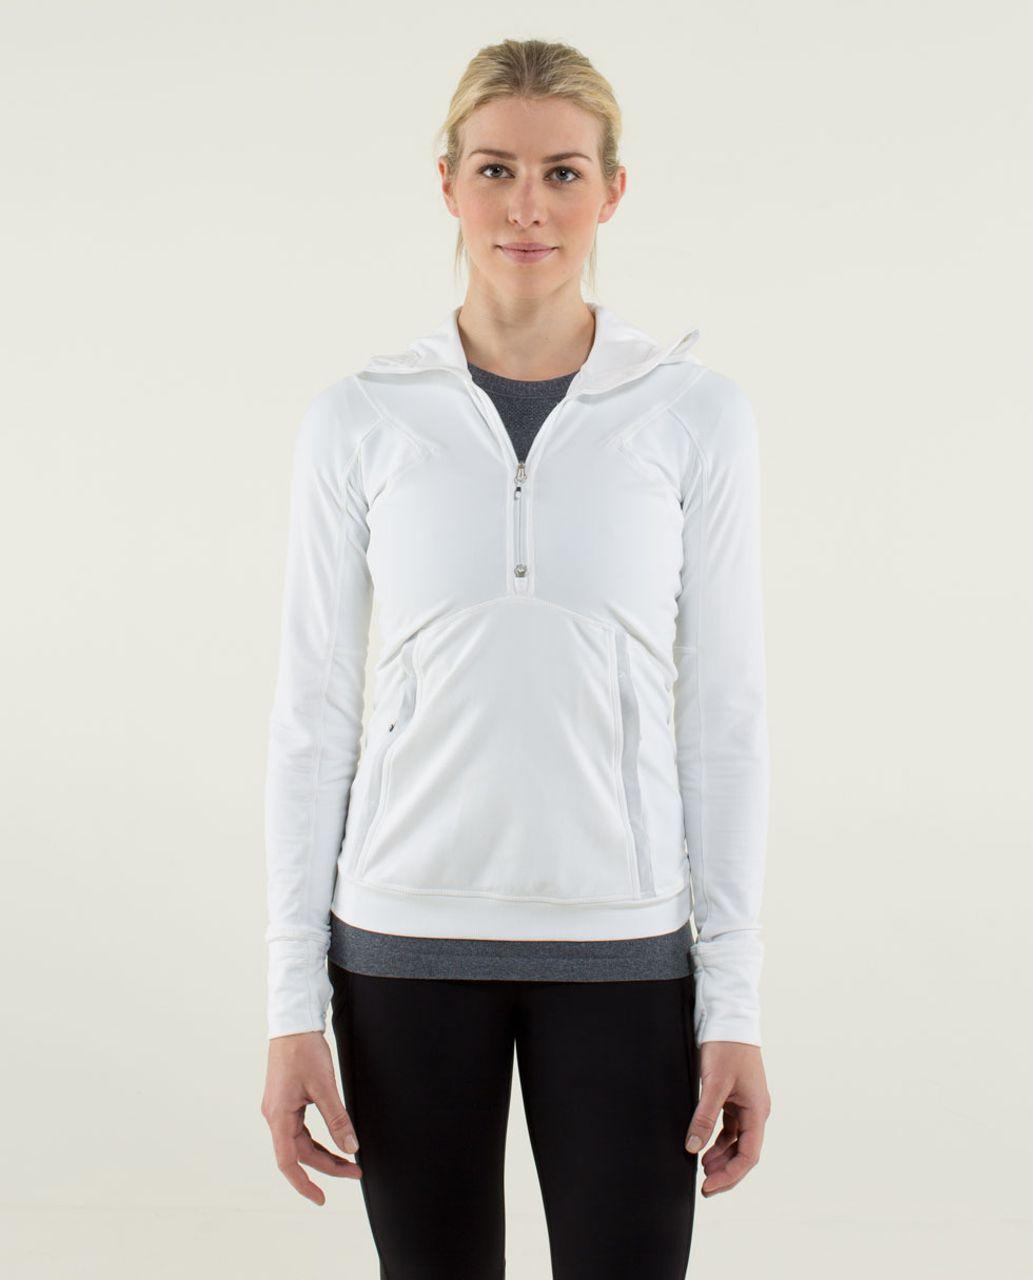 Lululemon Winter Sprinter Hoodie - White